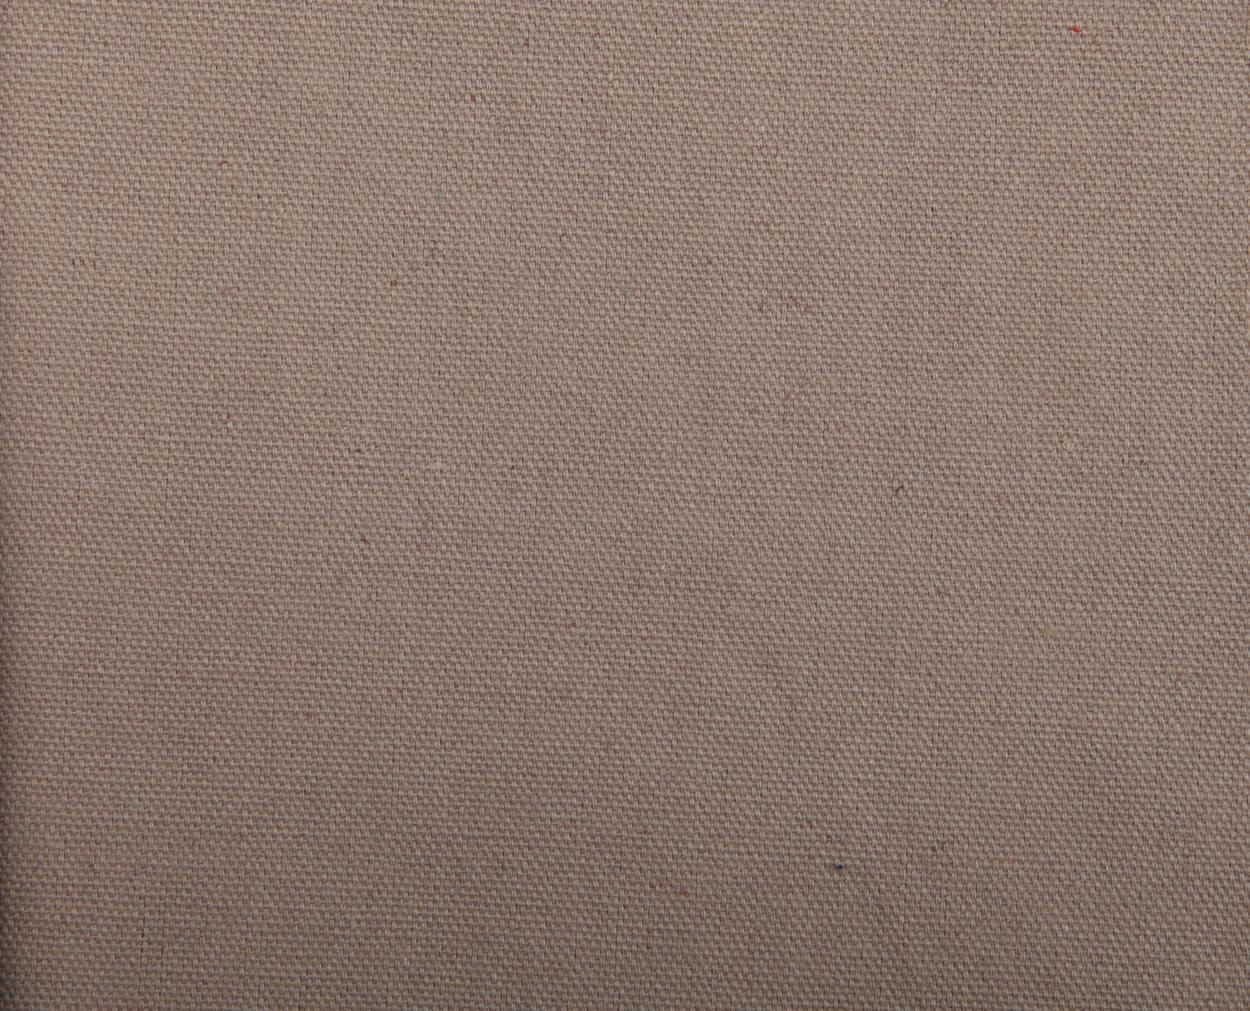 Canvas_04